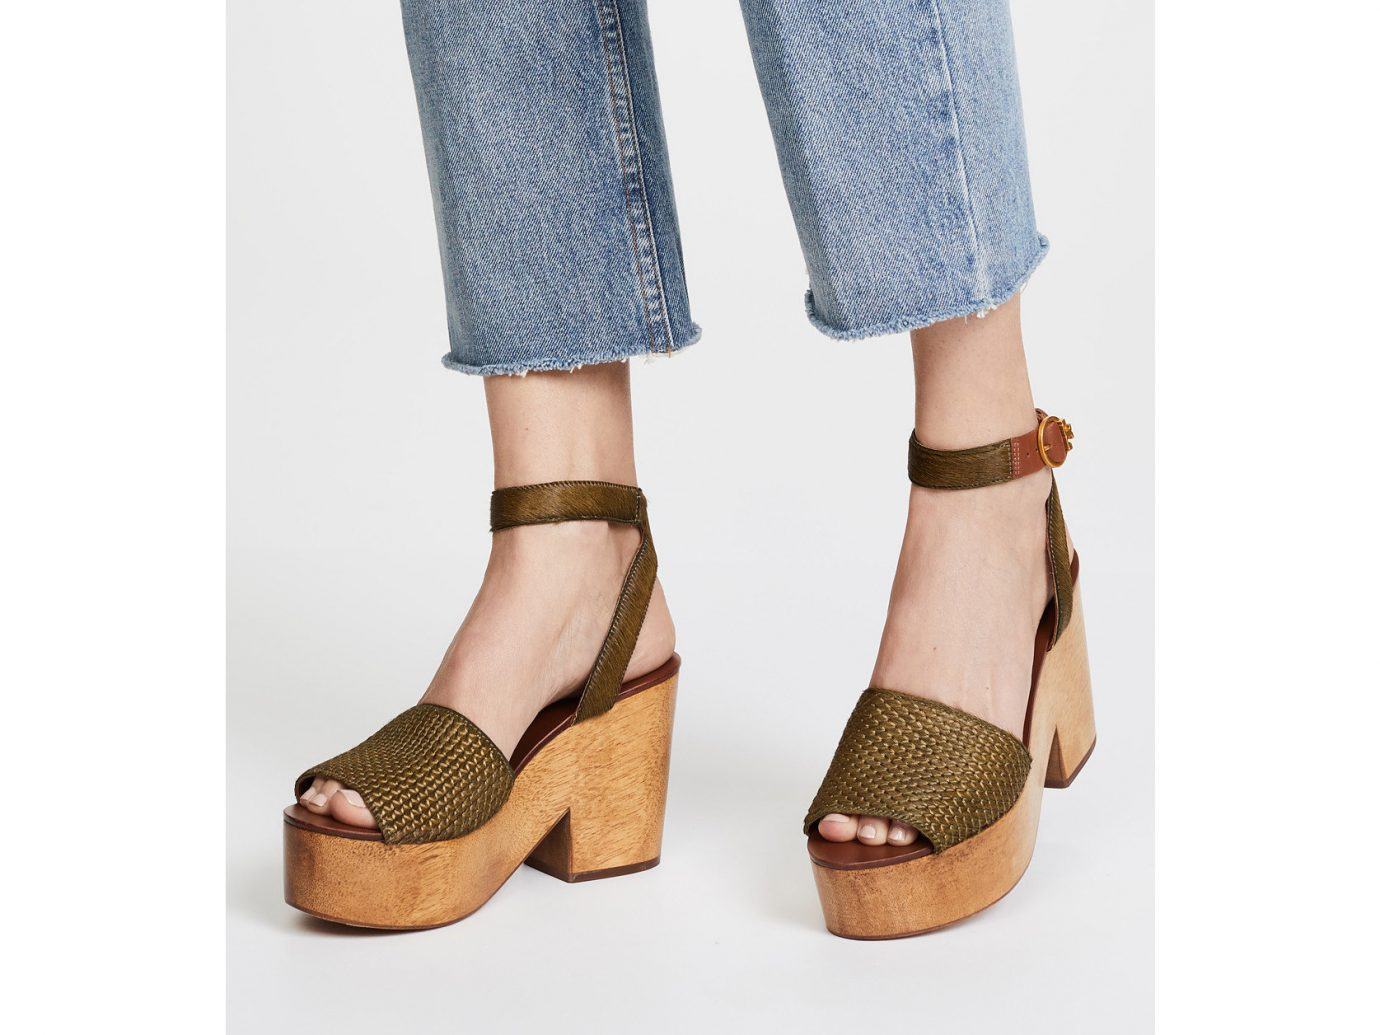 Spring Travel Style + Design Travel Shop person footwear clothing shoe wearing high heeled footwear sandal outdoor shoe shoes suit human leg ankle coat feet posing dressed tan